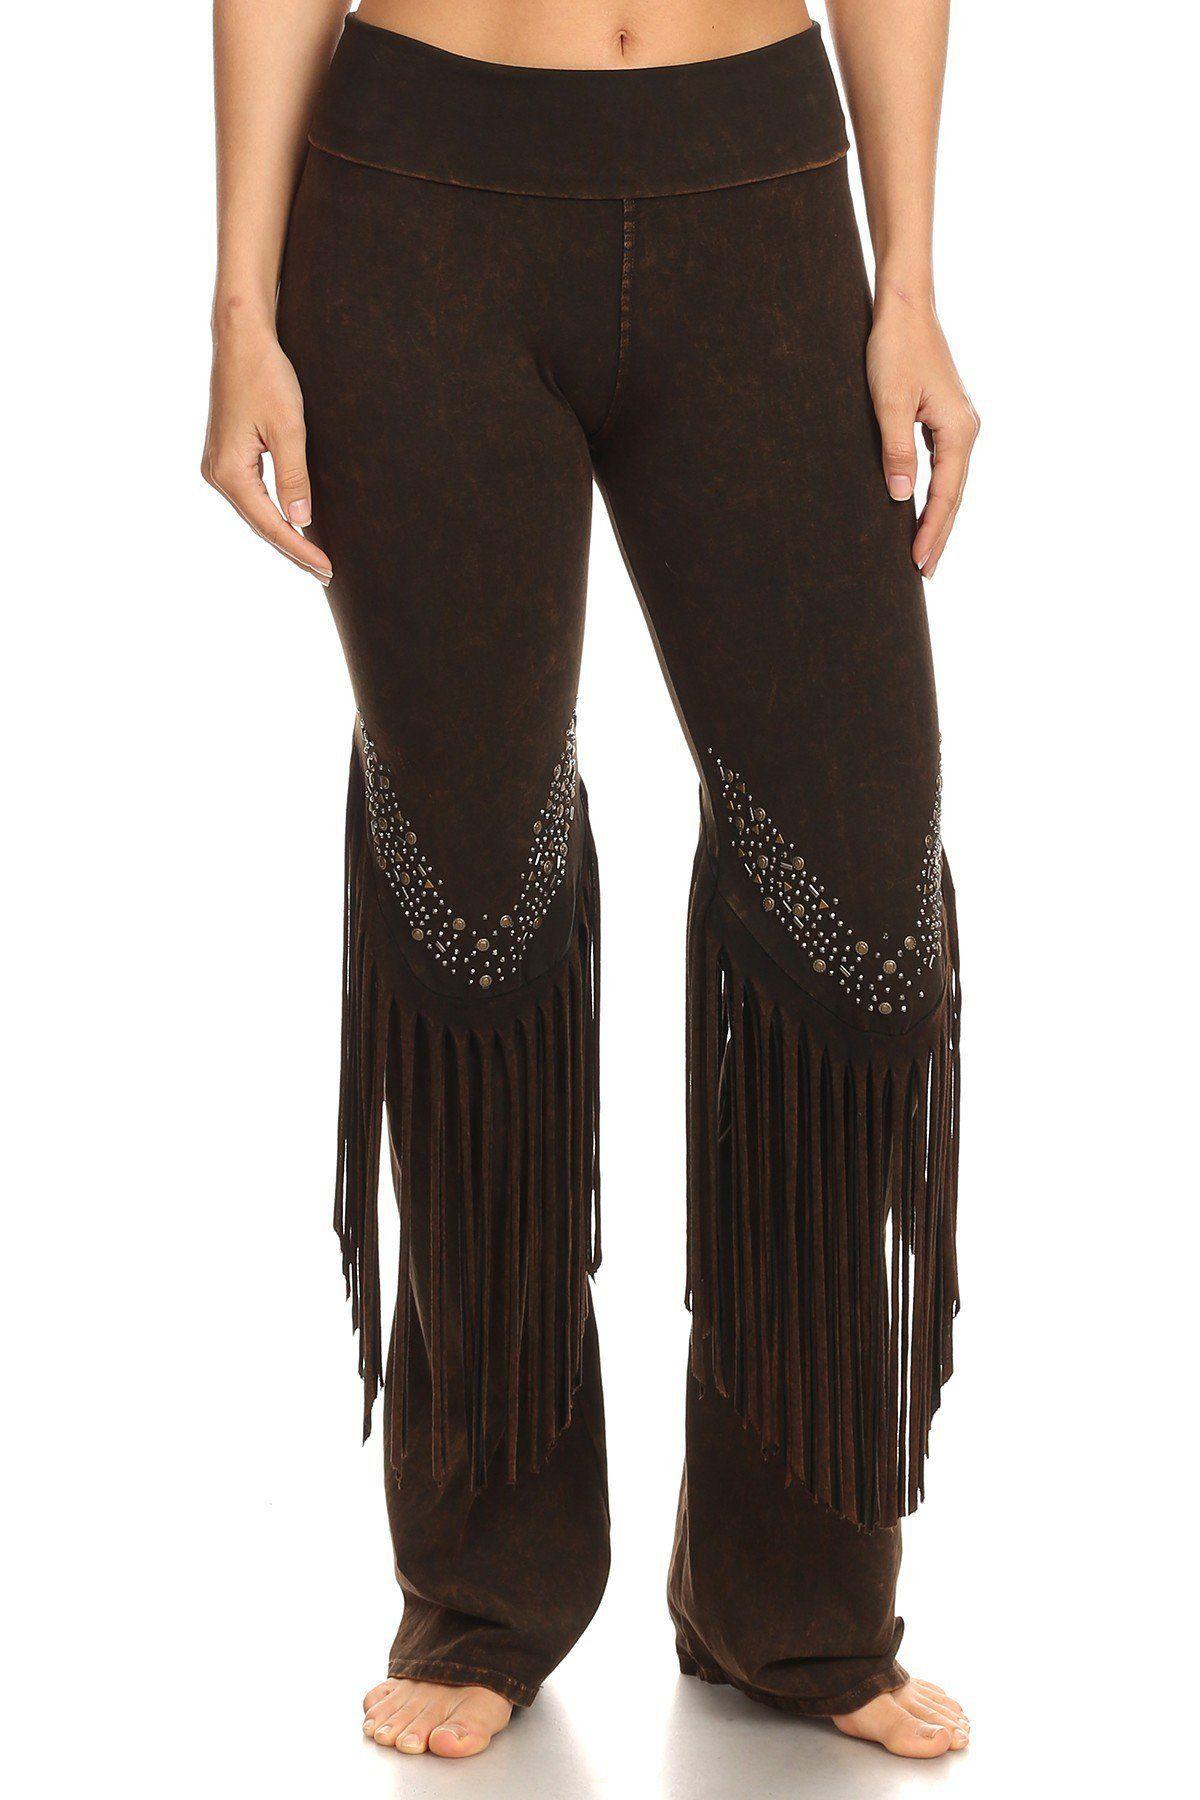 bae896a754 Stone Design Fringe Detail Yoga Pants   Products   Pants, Yoga Pants ...